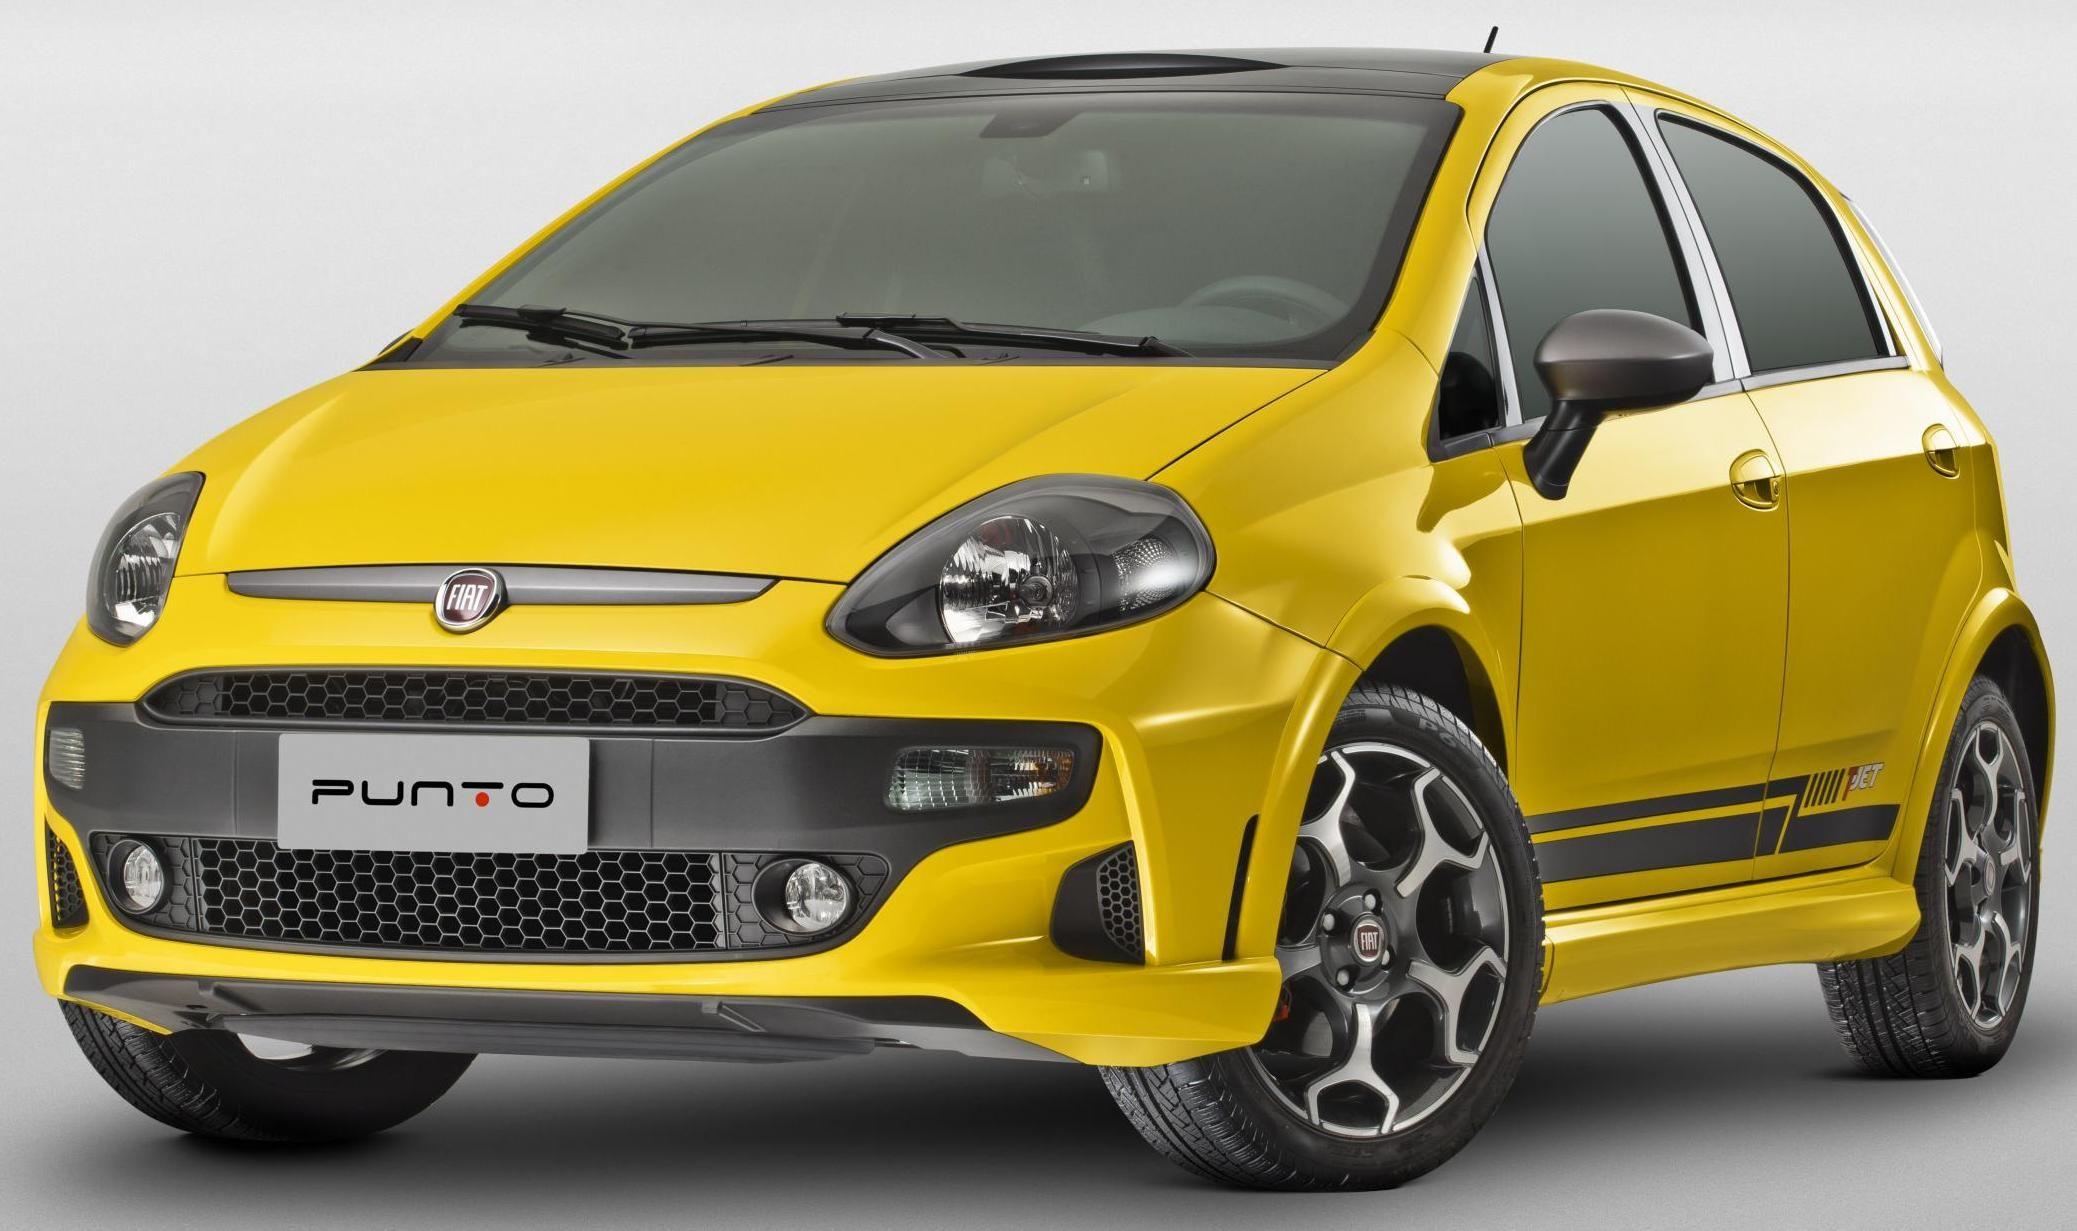 Fiat Punto Car Yellow Car Fiat